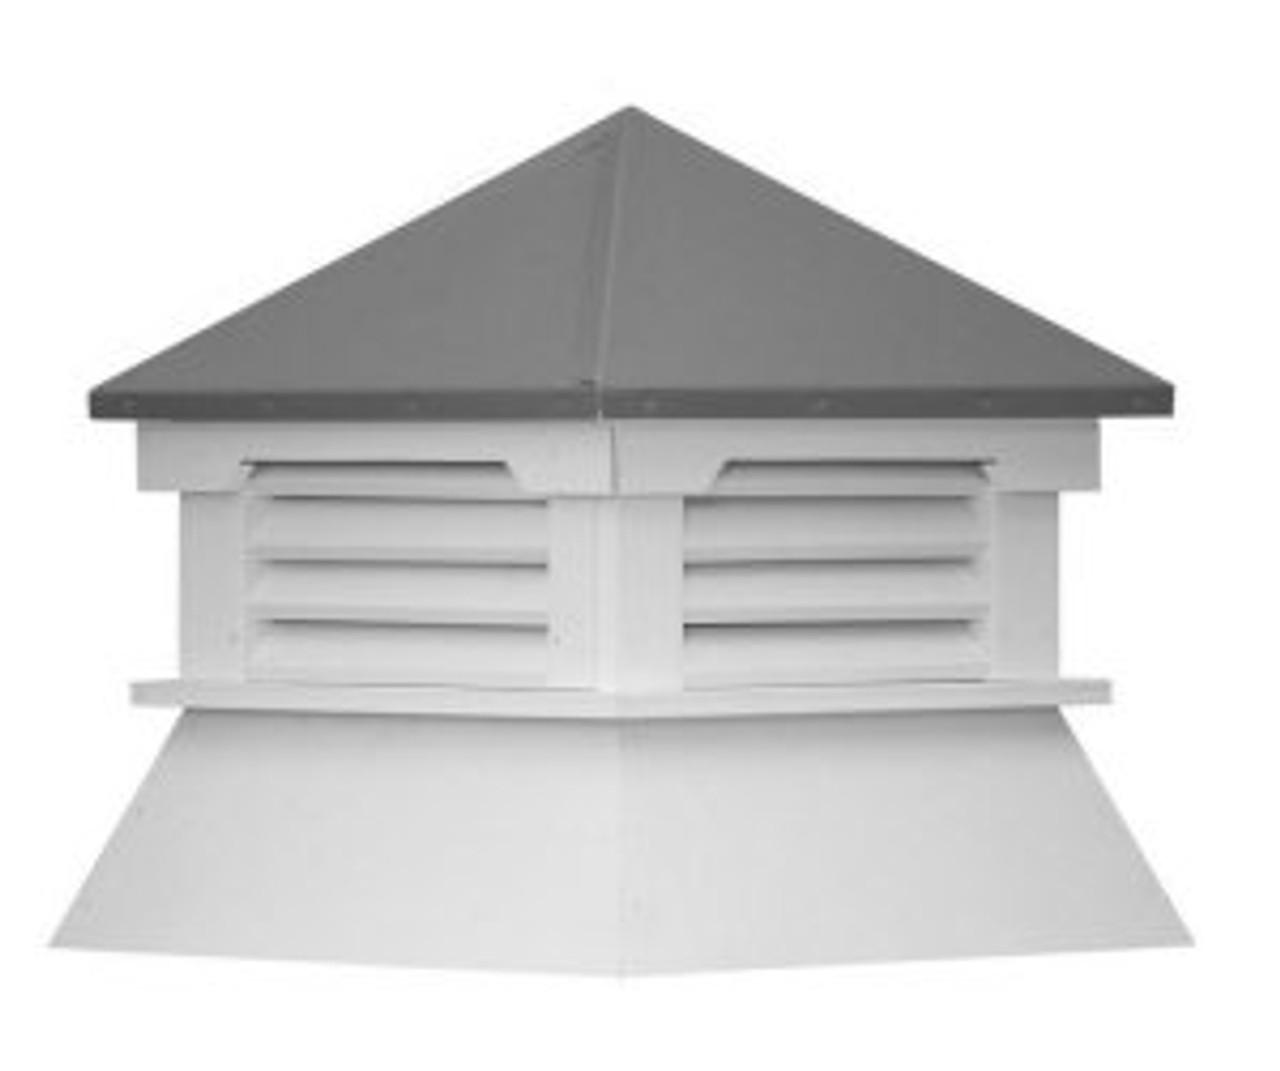 Cupola - Classic Shed: Azek - Aluminum Top - 21Lx21Wx23H